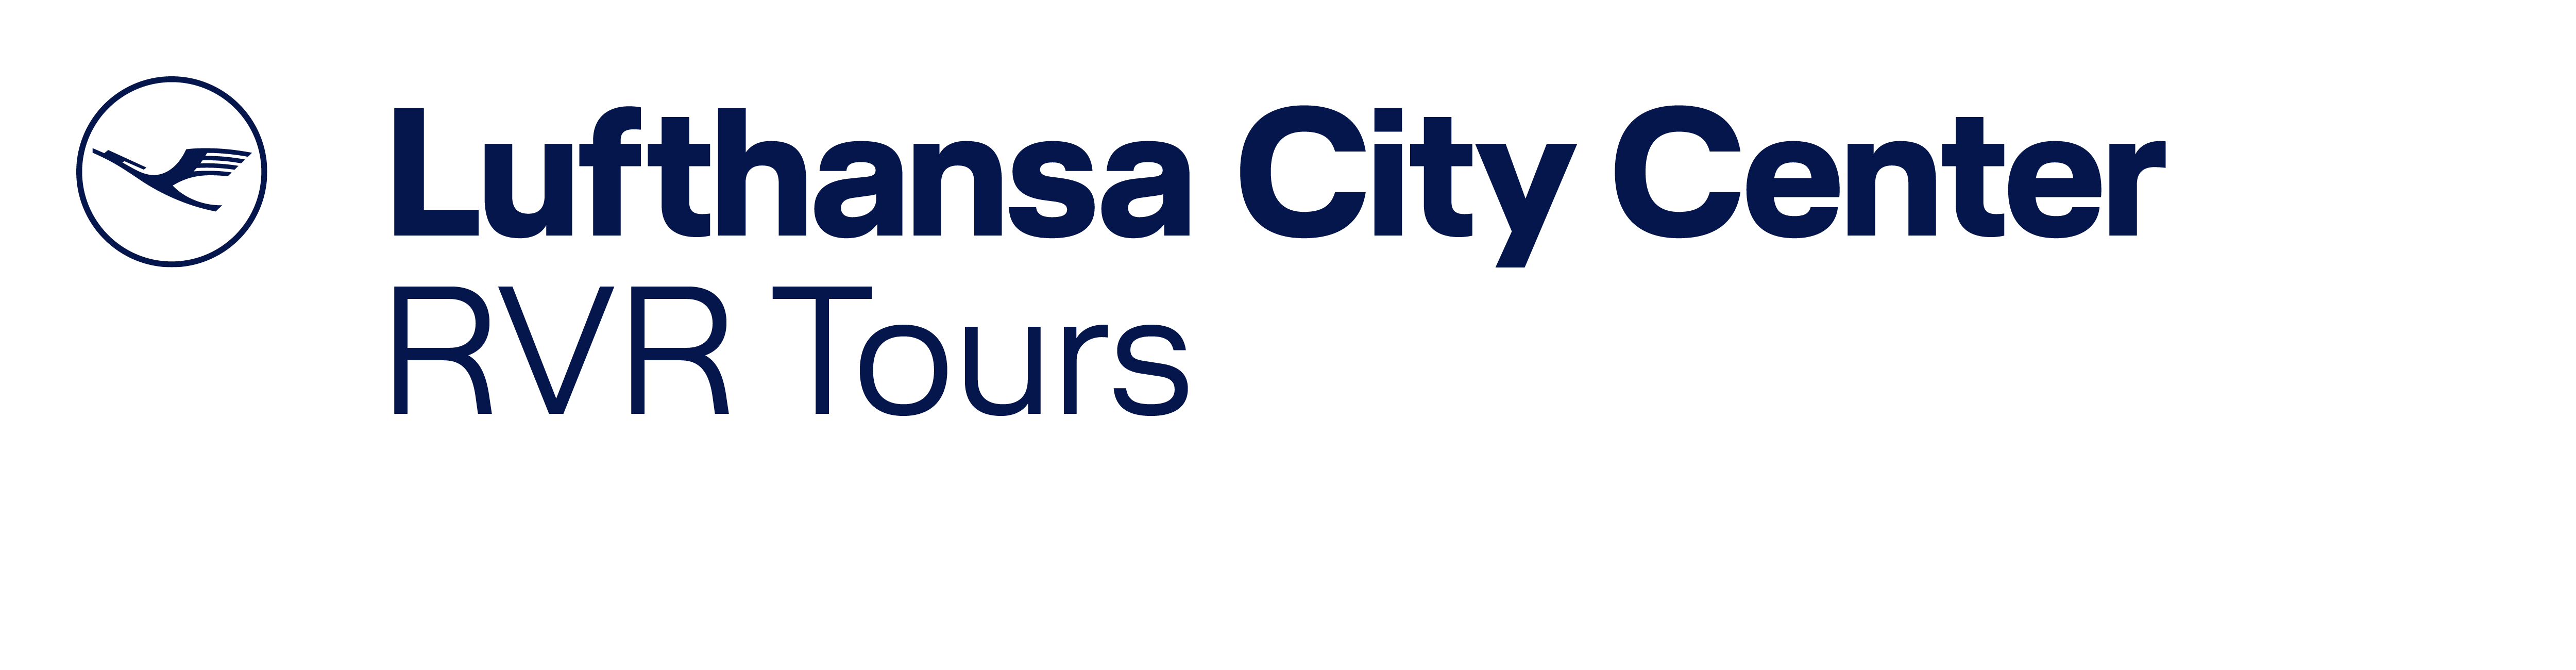 RVR Tours GmbH Lufthansa City Center